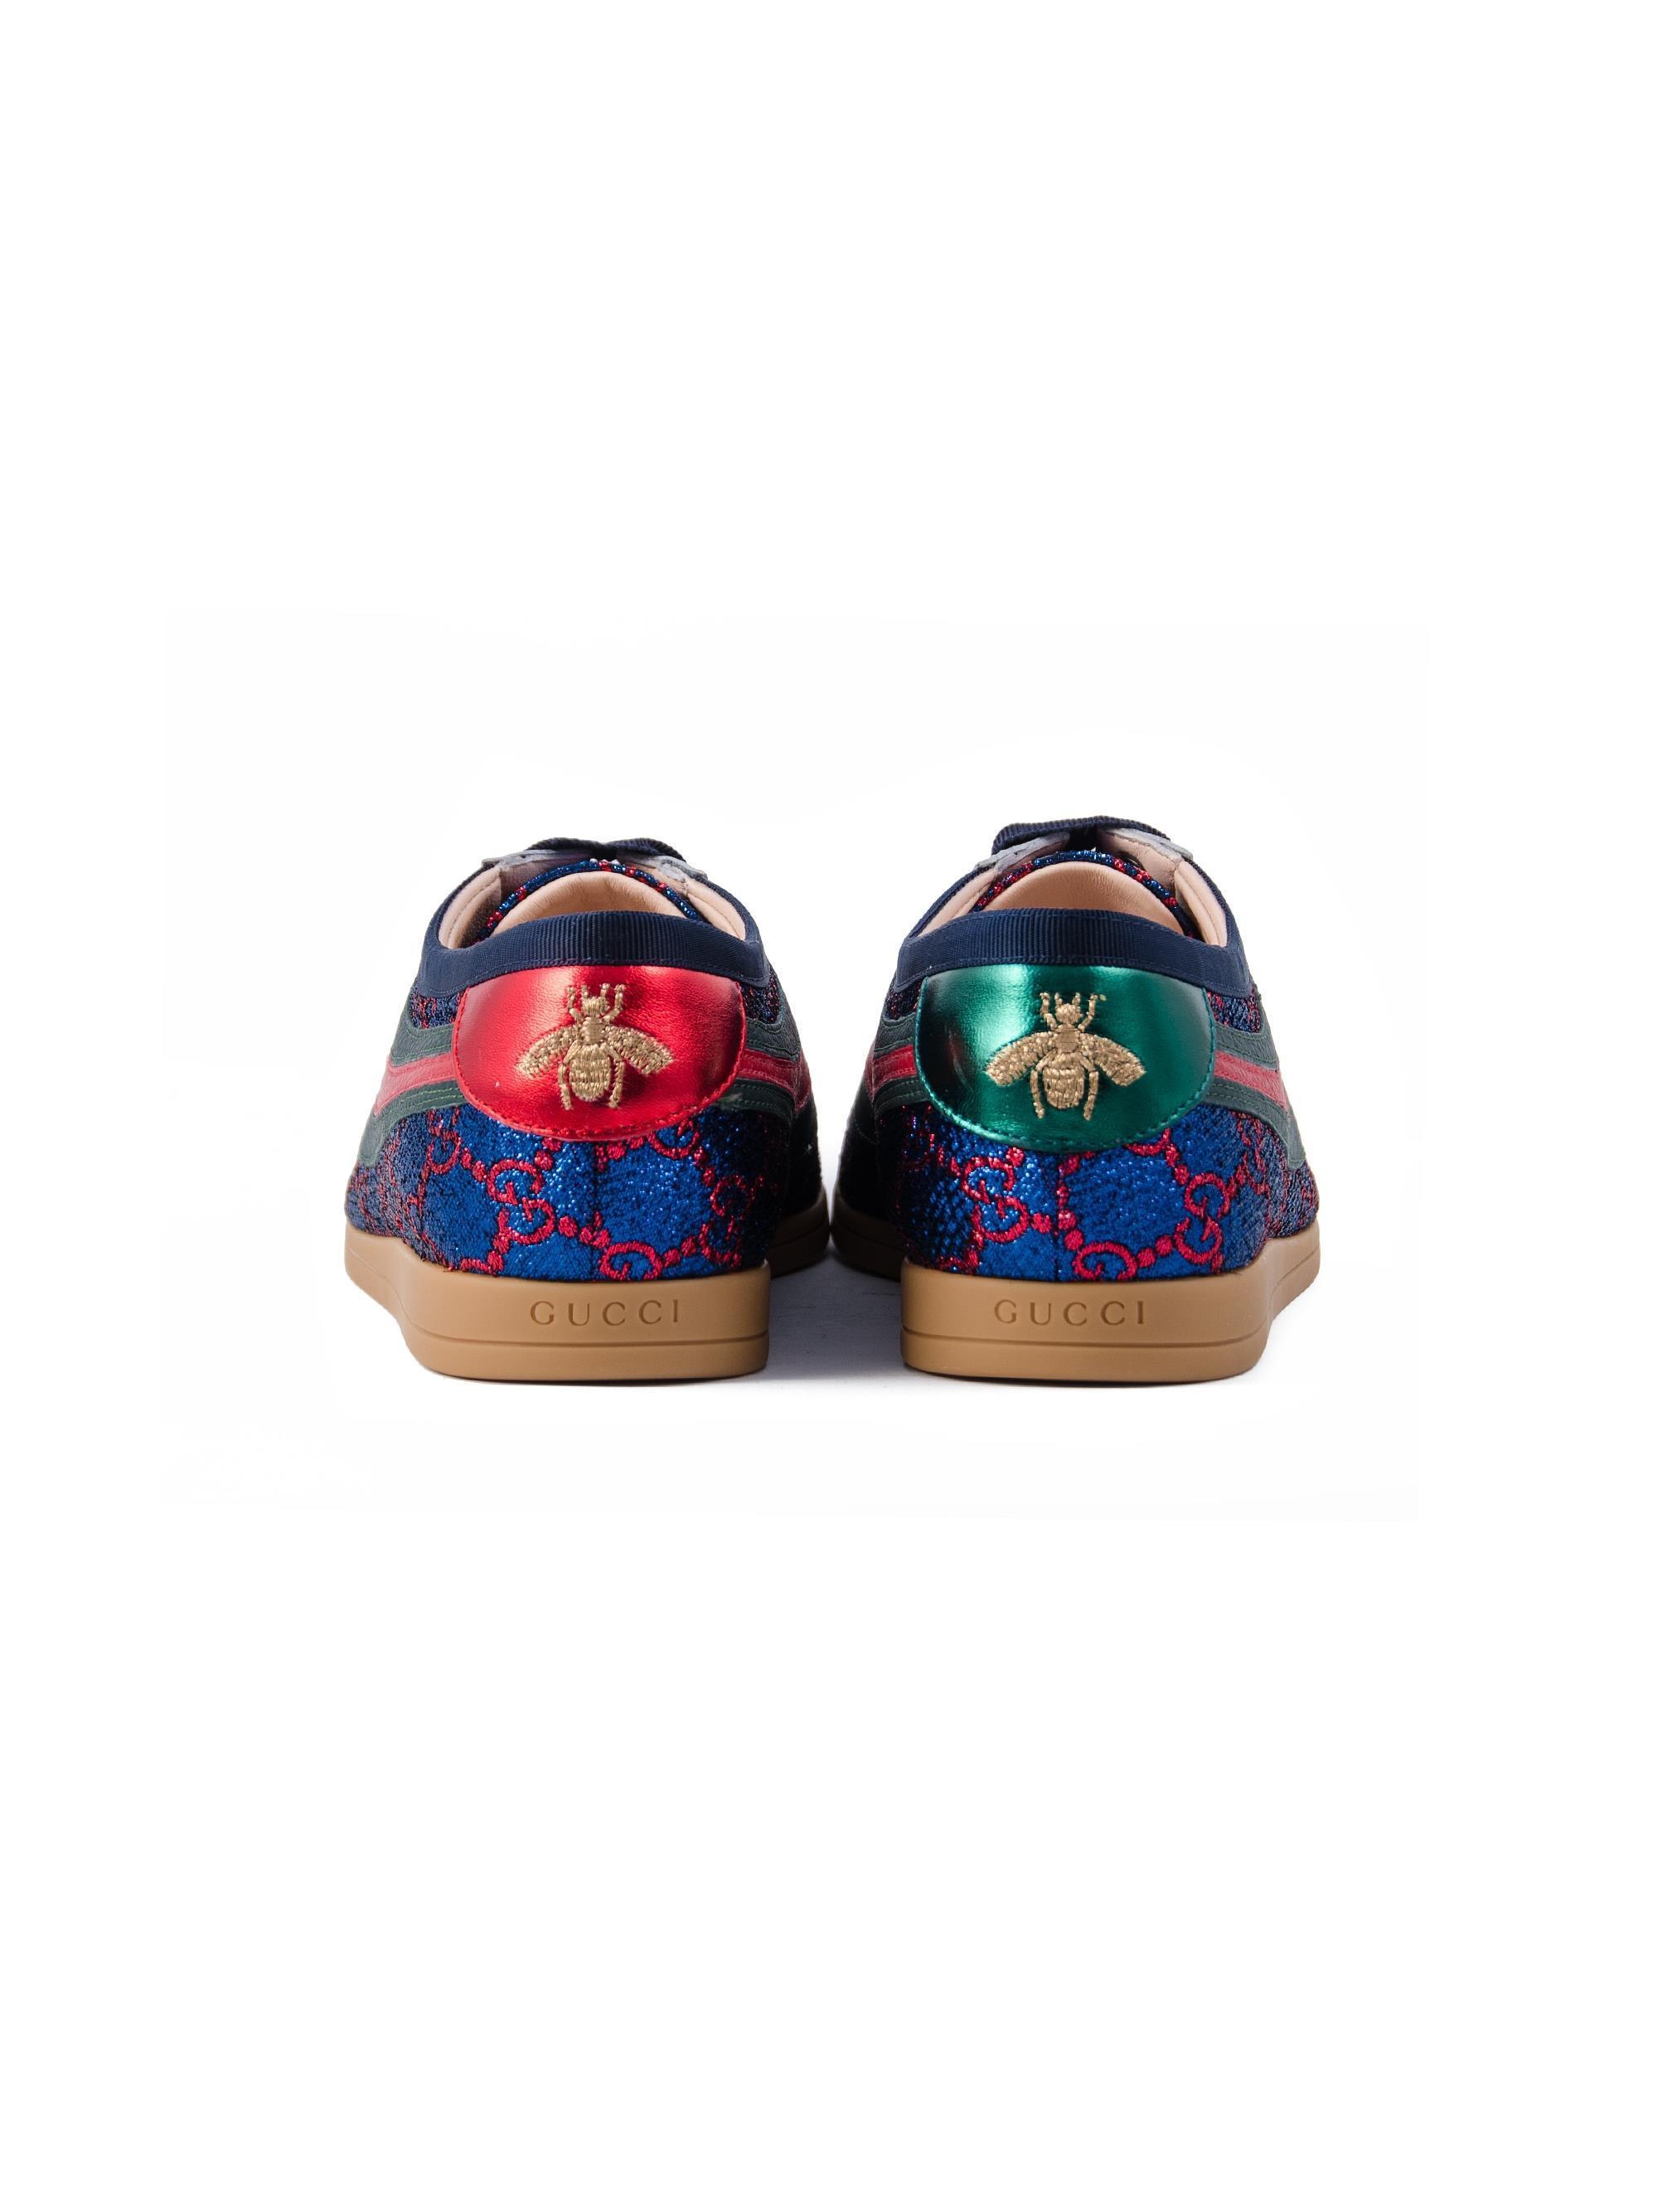 7b33bb44f Gucci - Blue Falacer Lurex GG Sneaker With Web - Lyst. View fullscreen